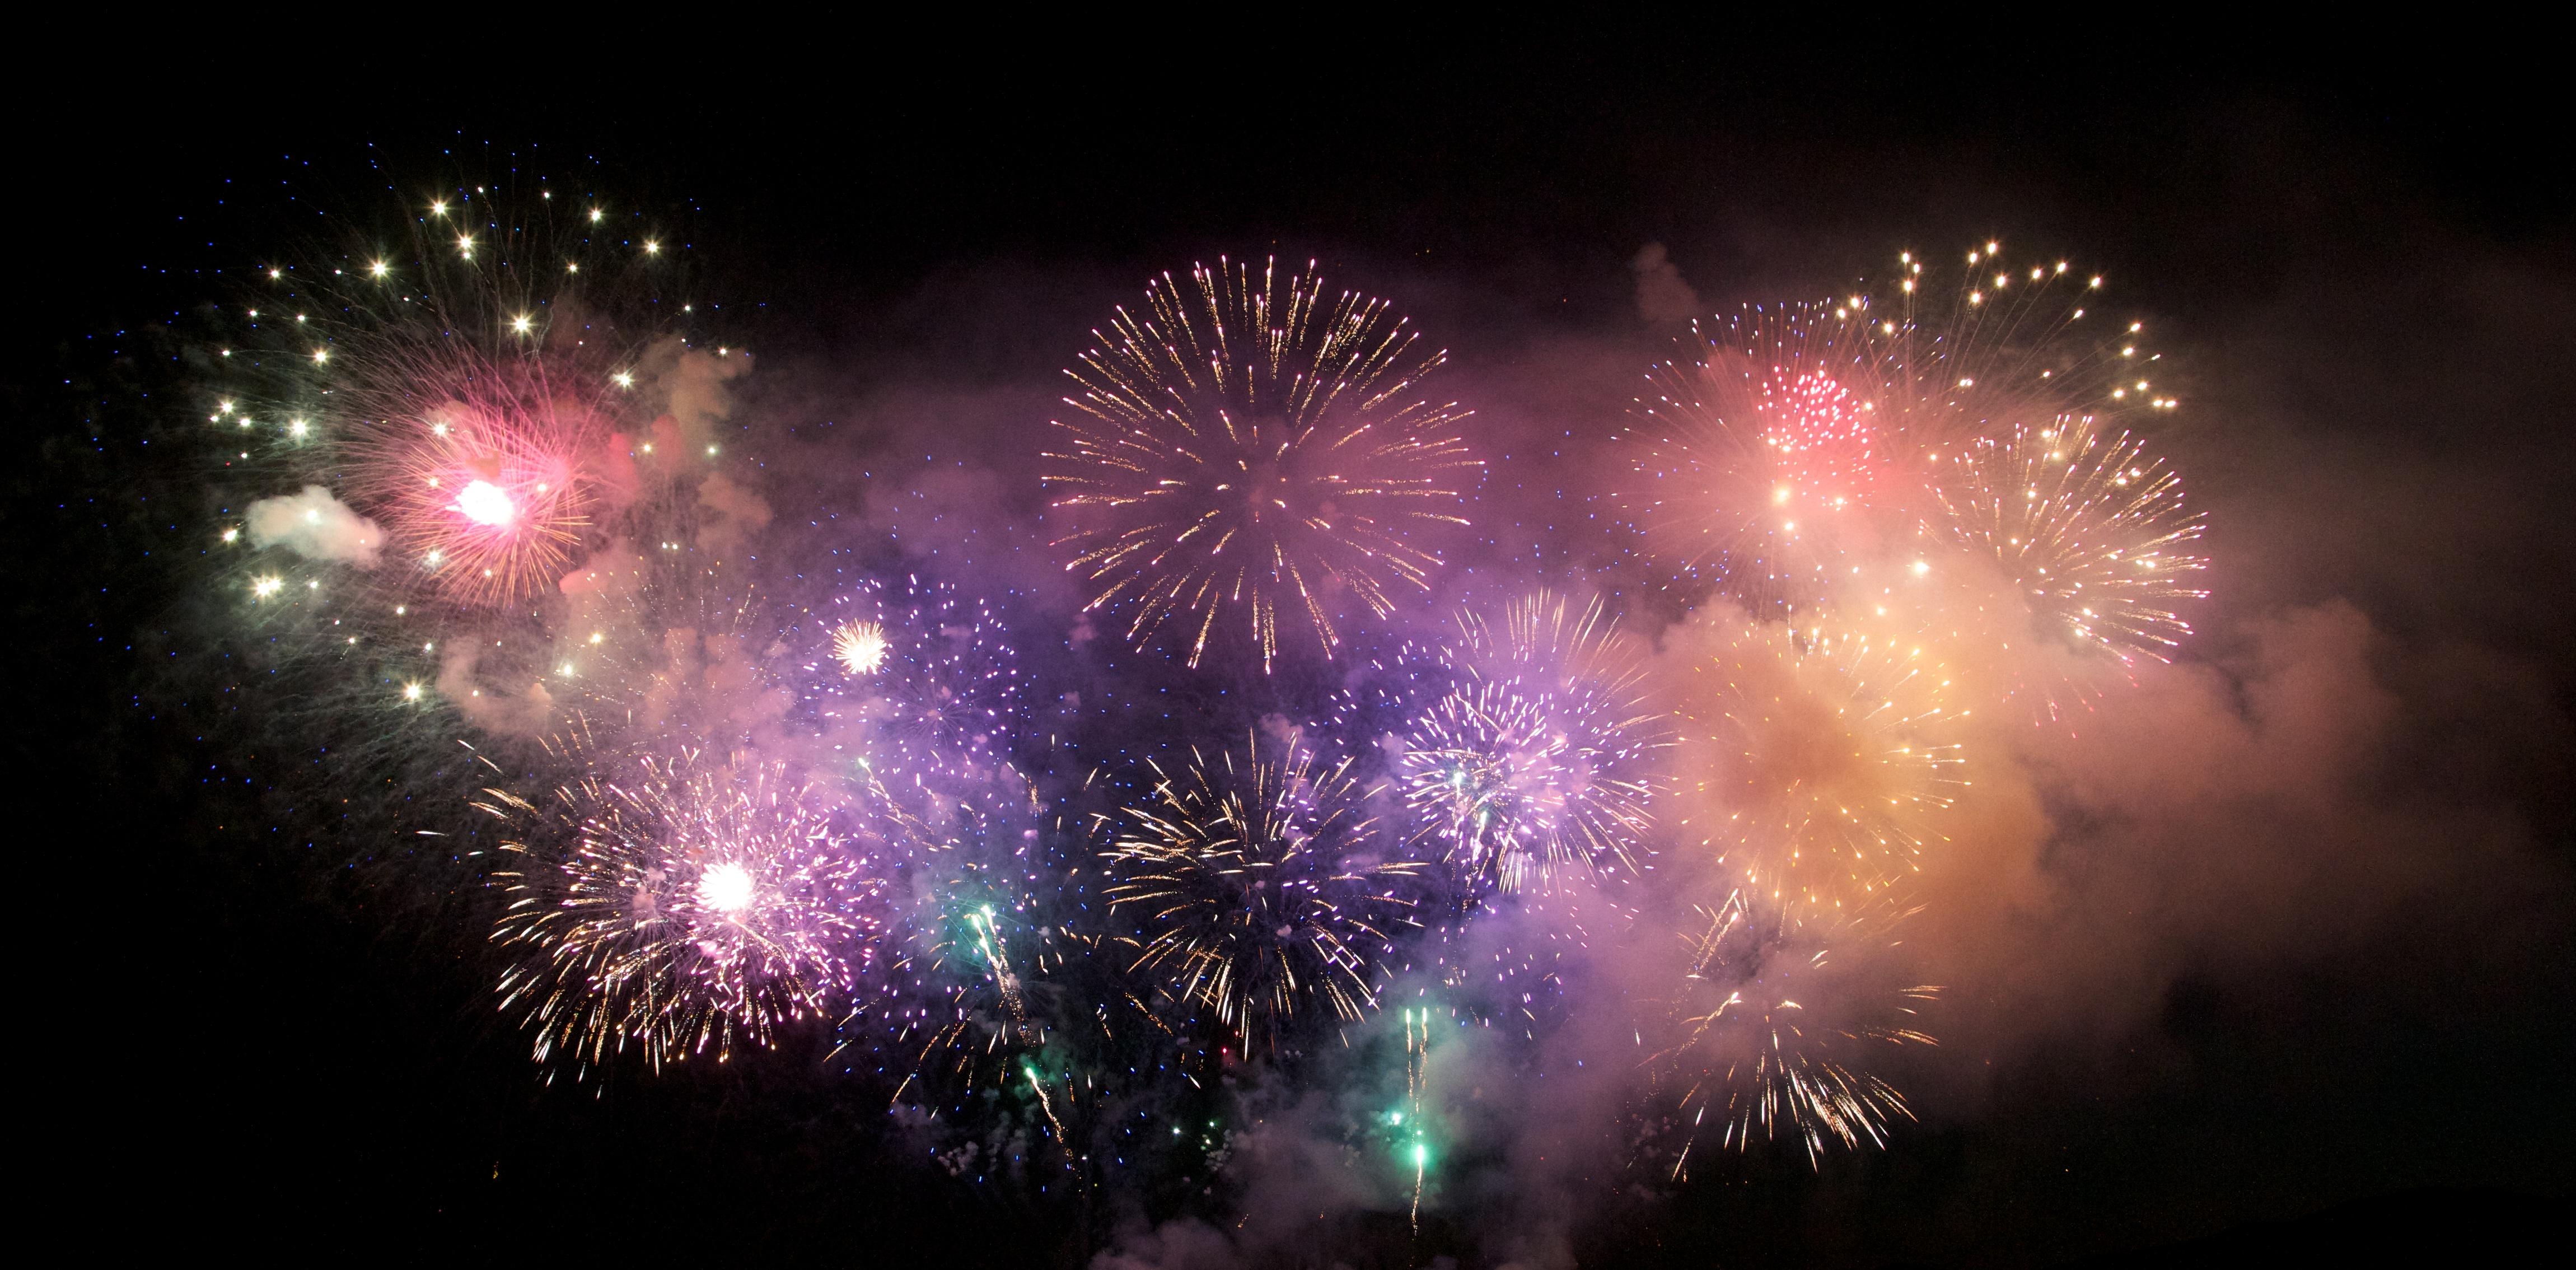 minecraft how to make fireworks last longer